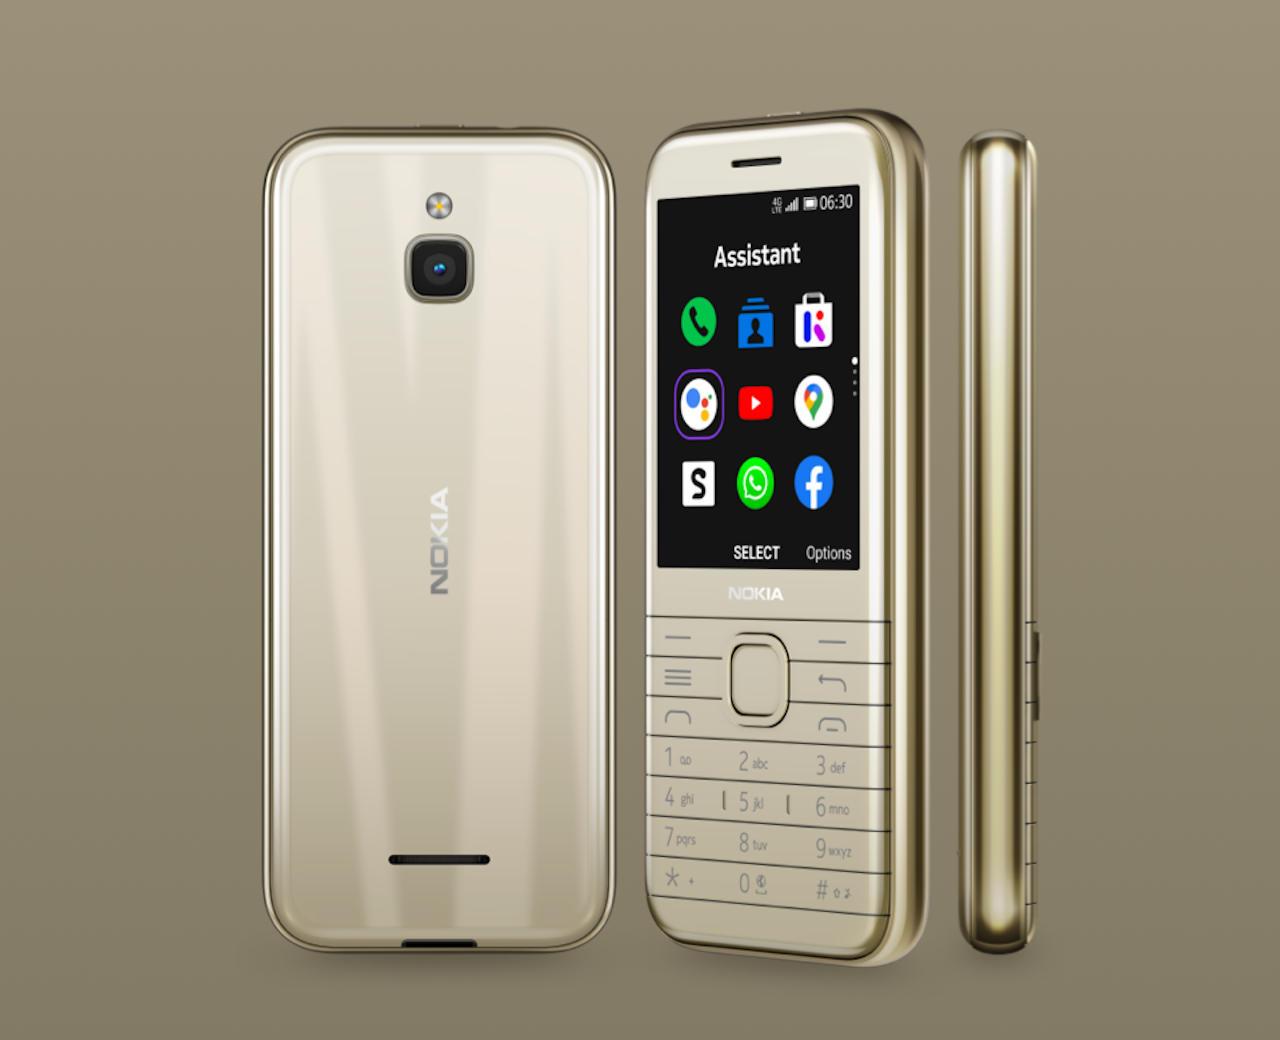 nokia_8000_4G-GOODLE_ASSISTANT_bg-mobile